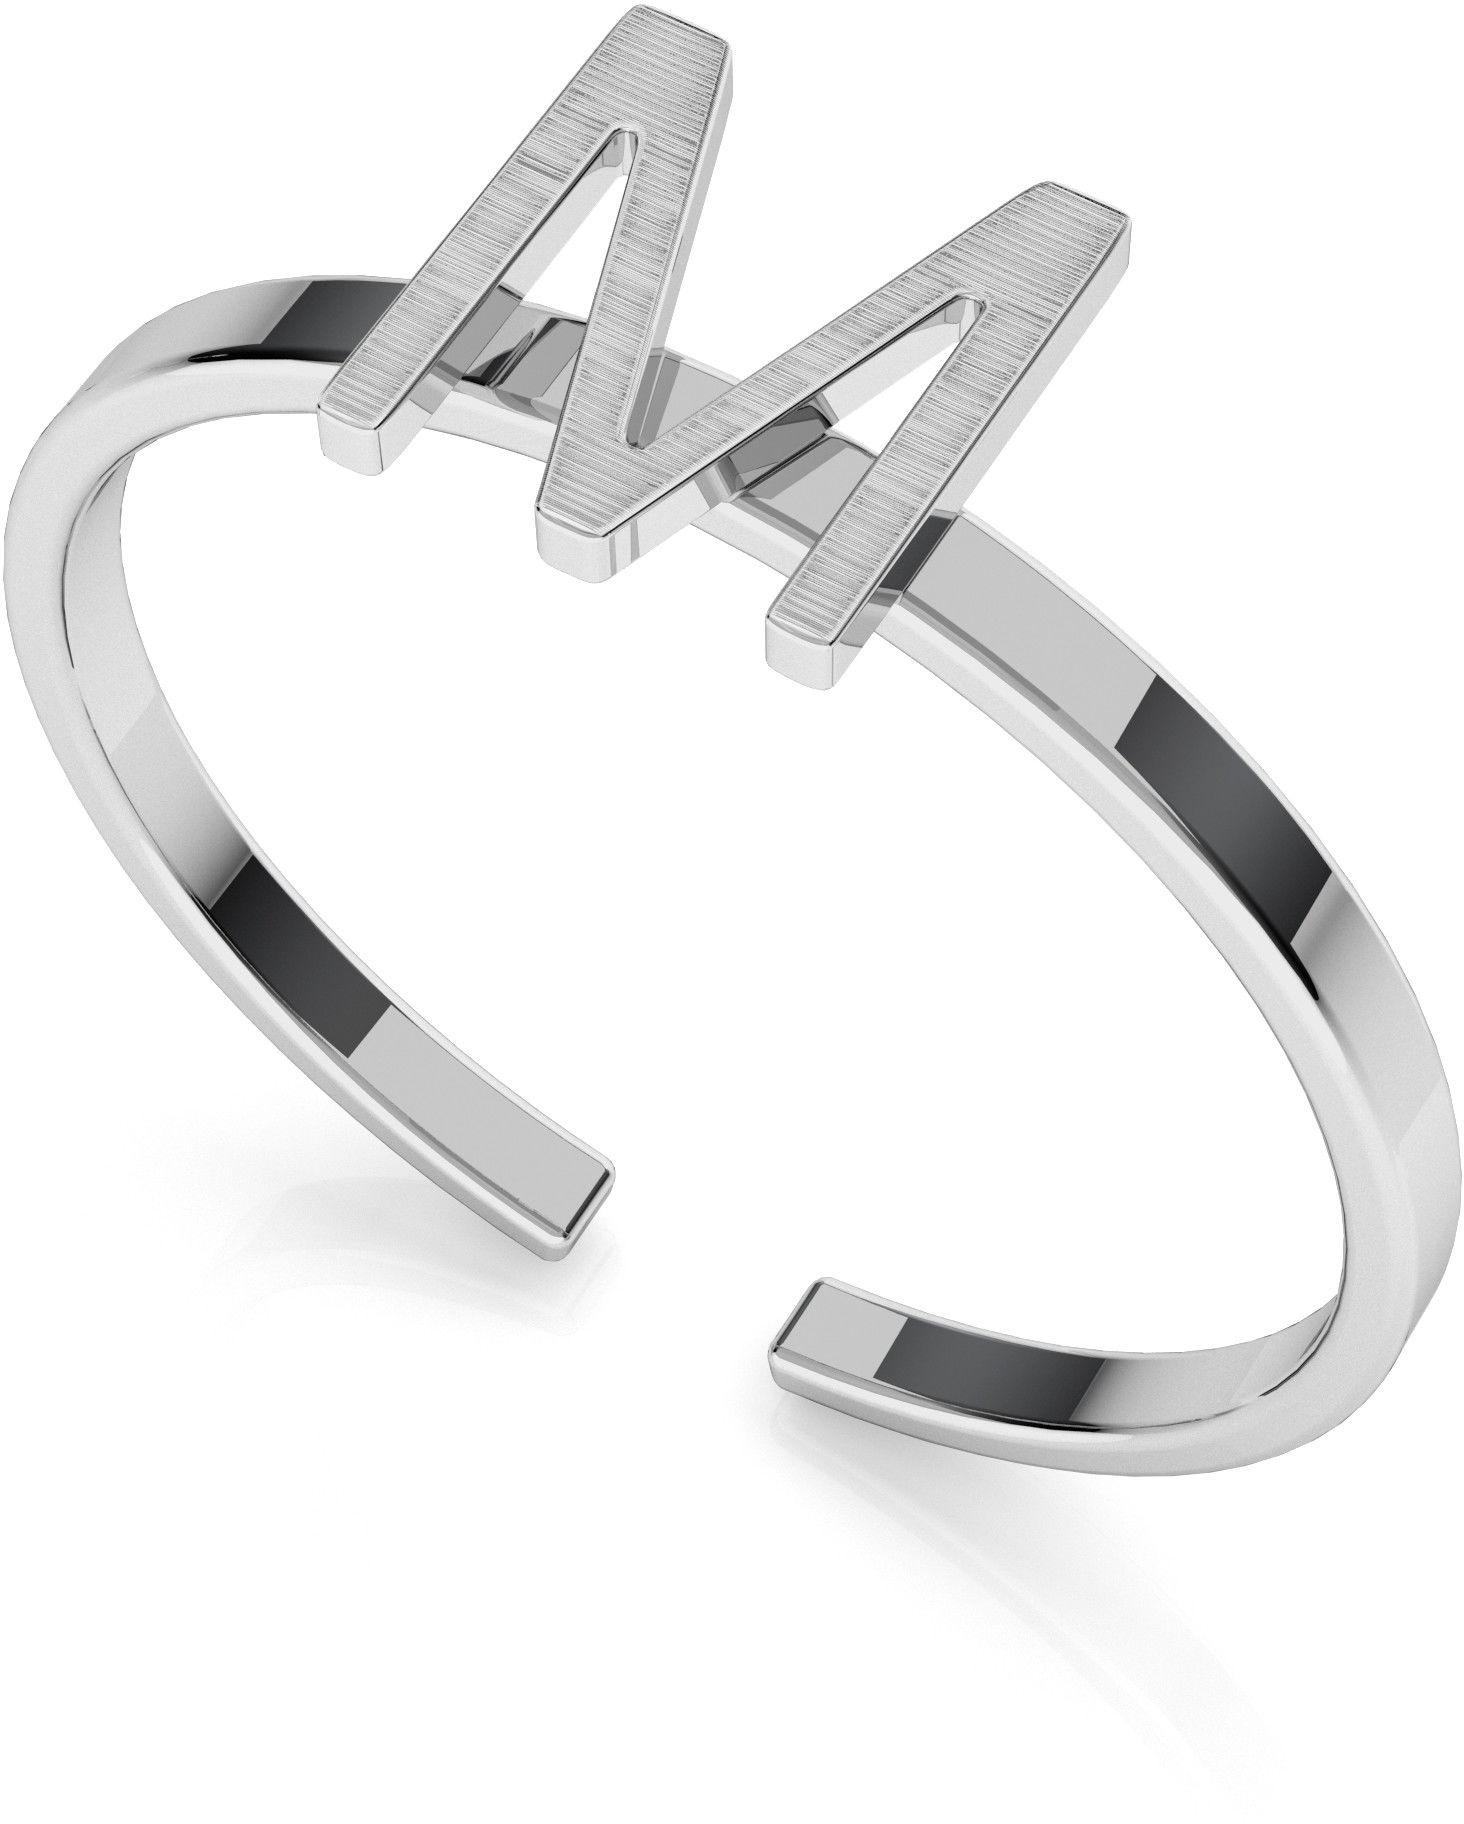 Srebrny pierścionek z literką My RING, srebro 925 : Litera - M, Srebro - kolor pokrycia - Pokrycie platyną